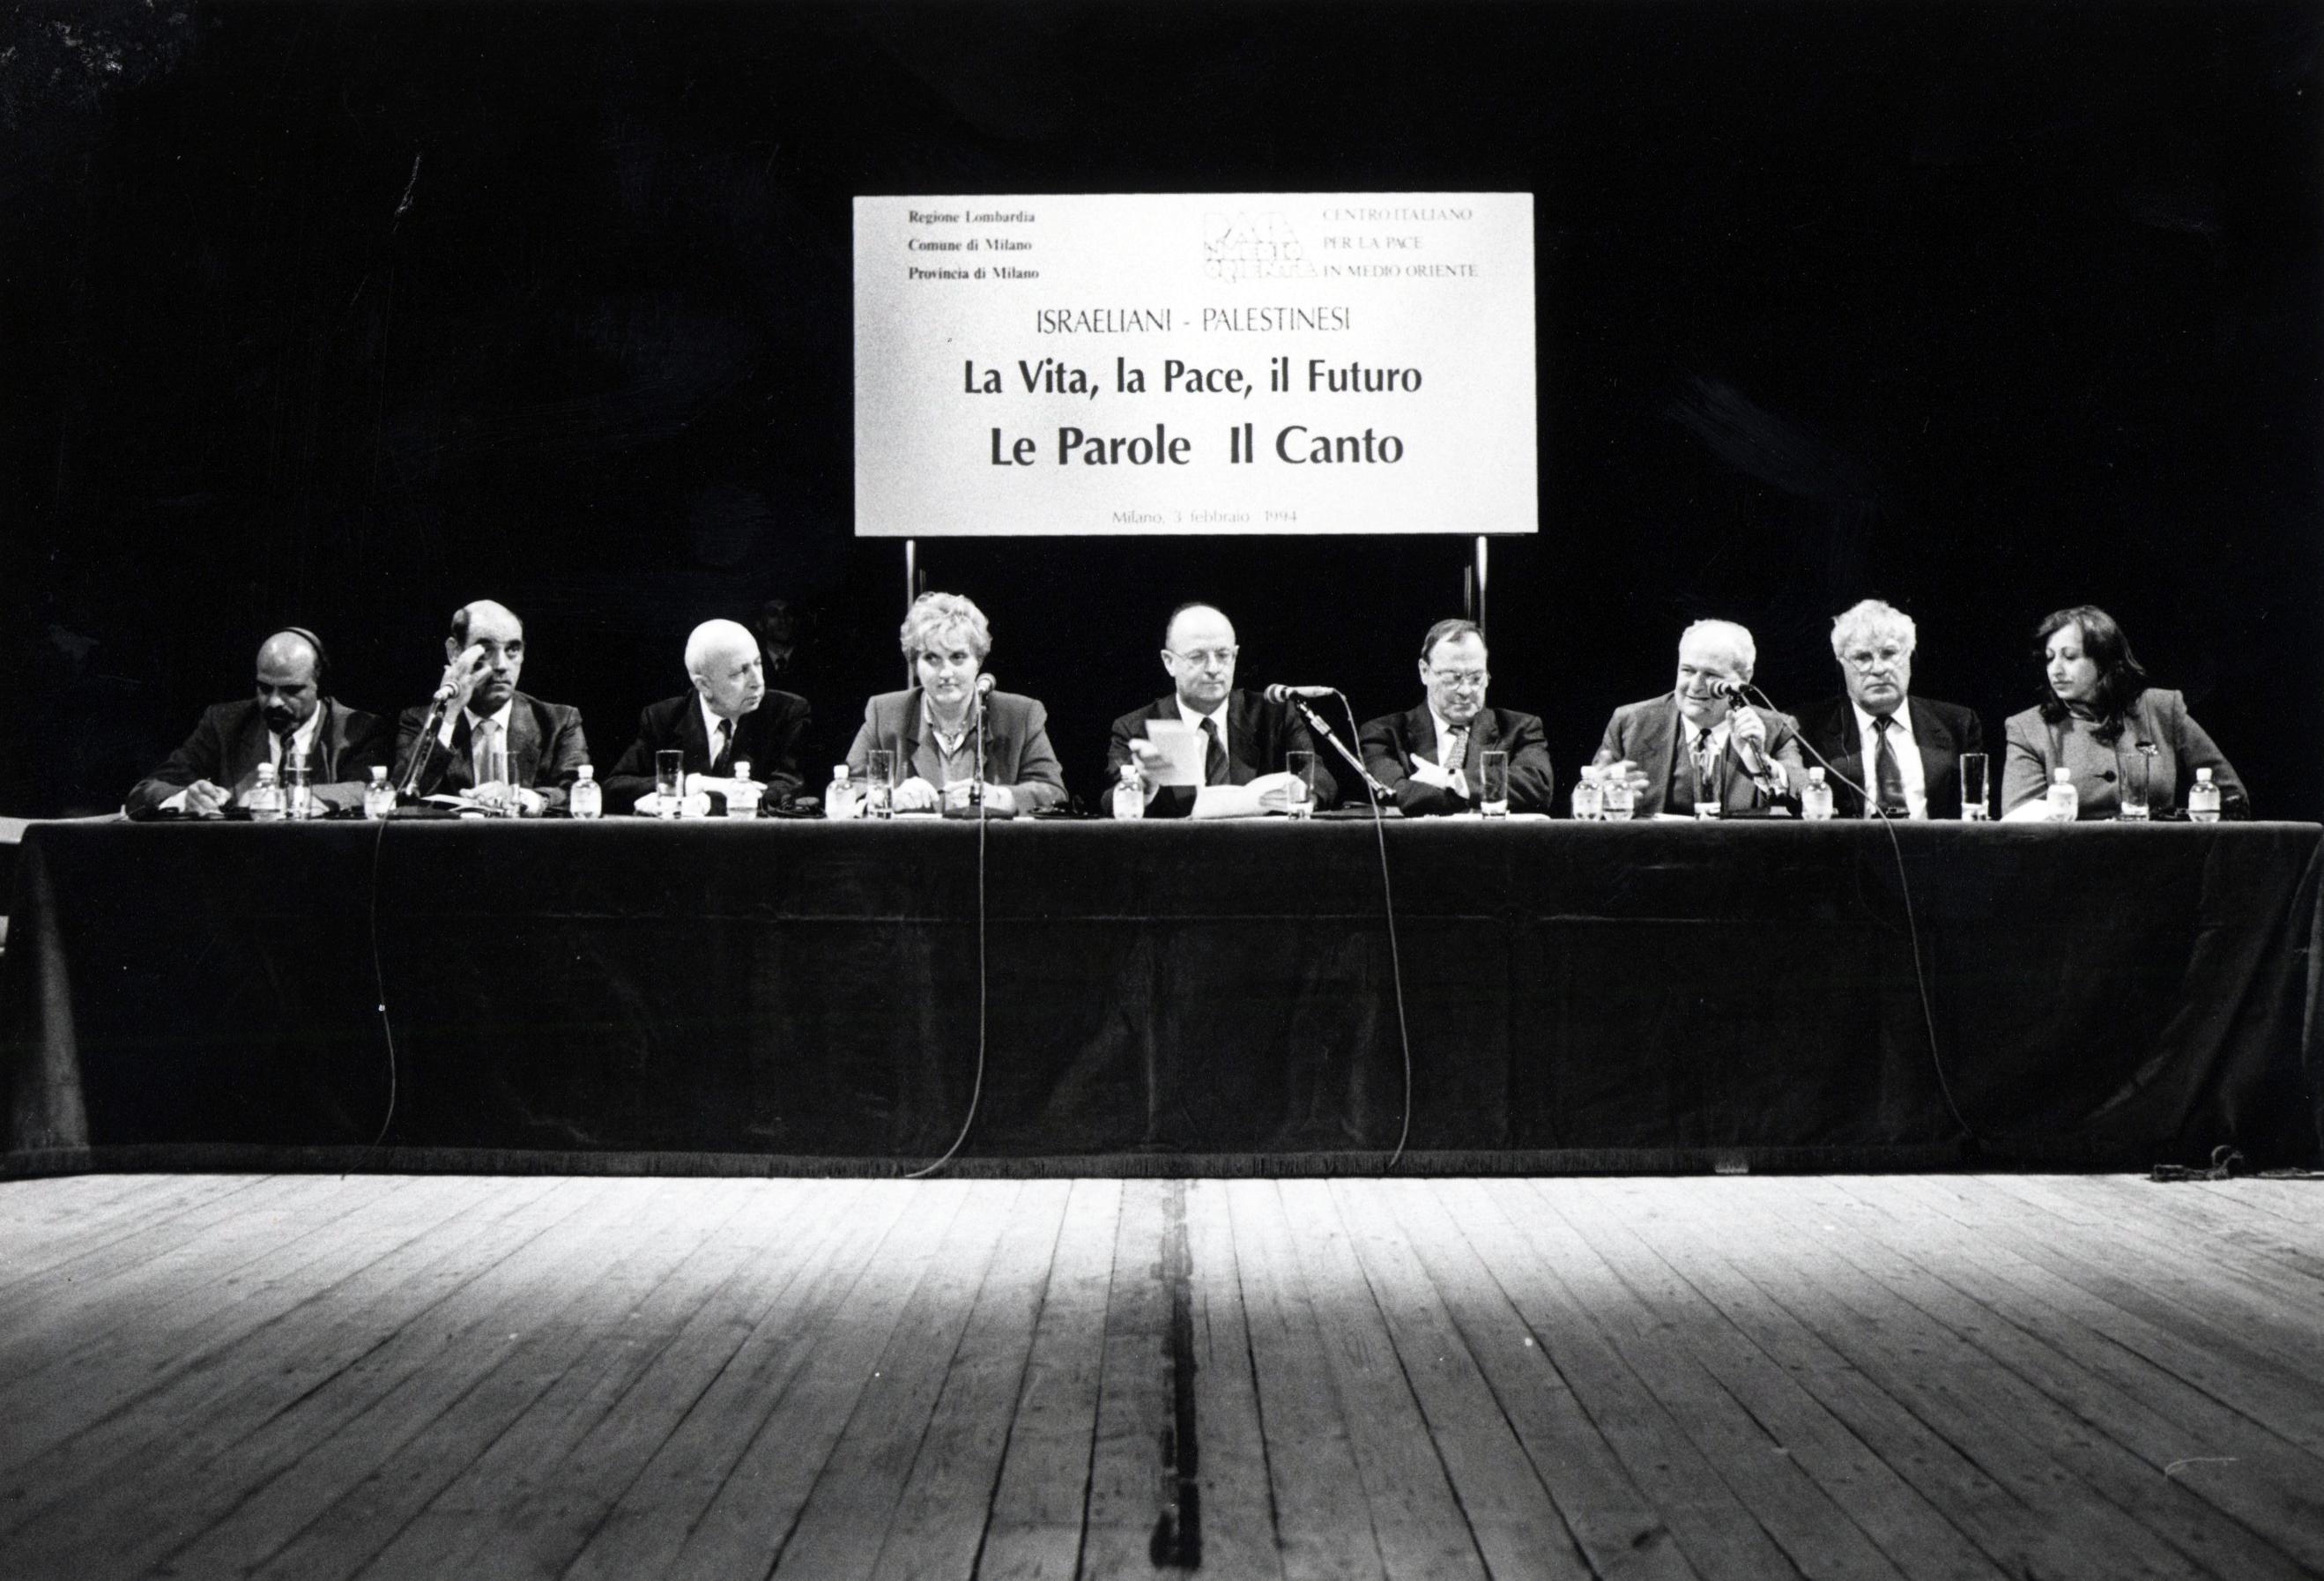 Da sinistra Radwan Abu Ayash, Nemer Hammad, Avi Pazner, Fiorella Ghilardotti, Livio Tamber, Marco Formentini, Janiki Cingoli, Meron Benvenisti.